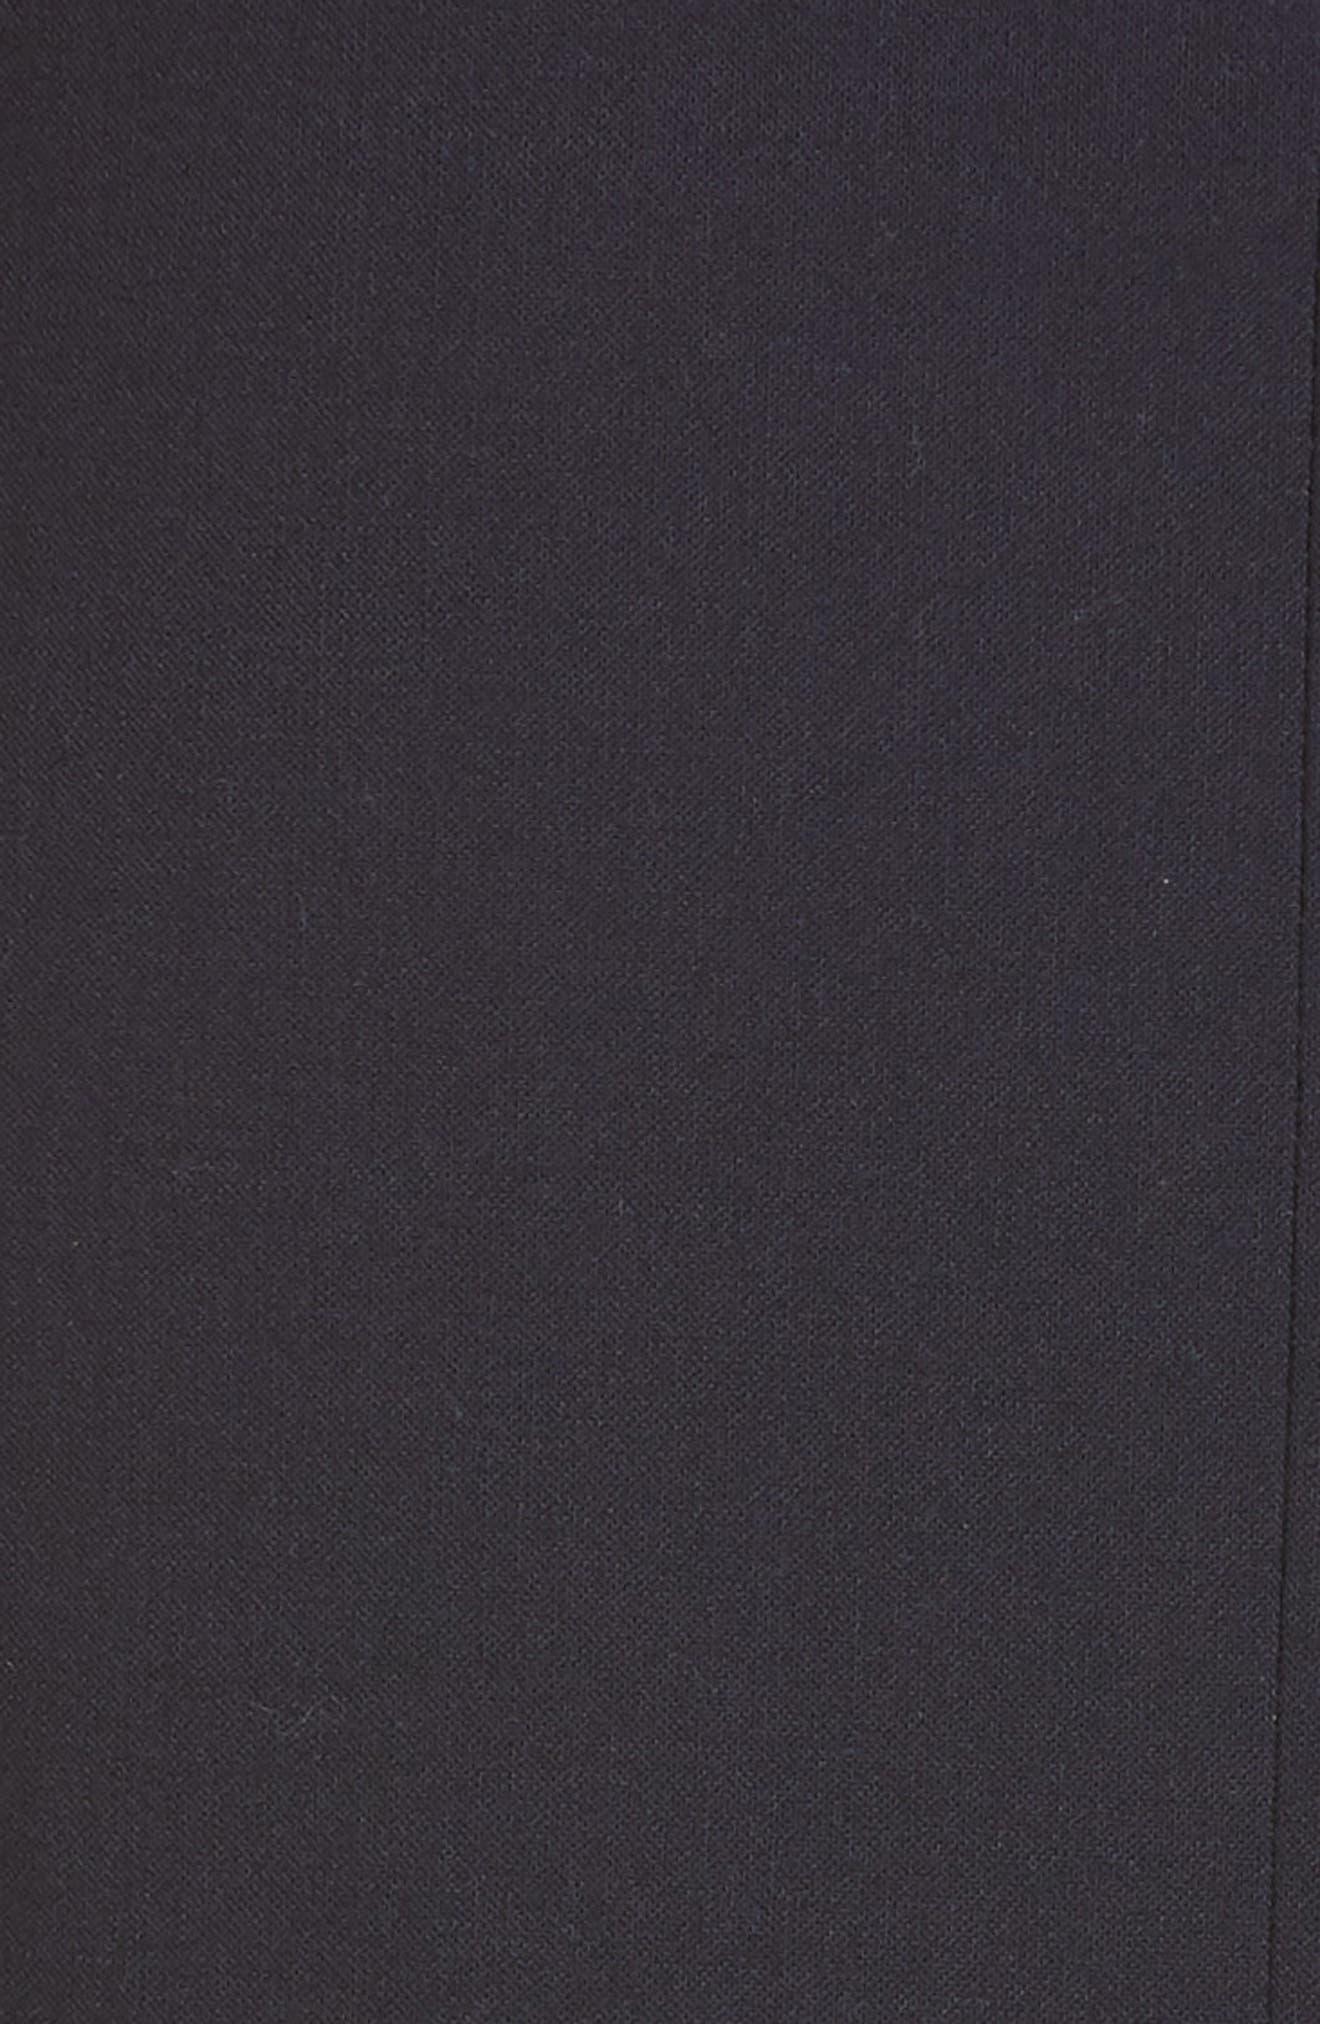 ADEAM,                             Bustier Handkerchief Dress,                             Alternate thumbnail 6, color,                             MIDNIGHT BLUE